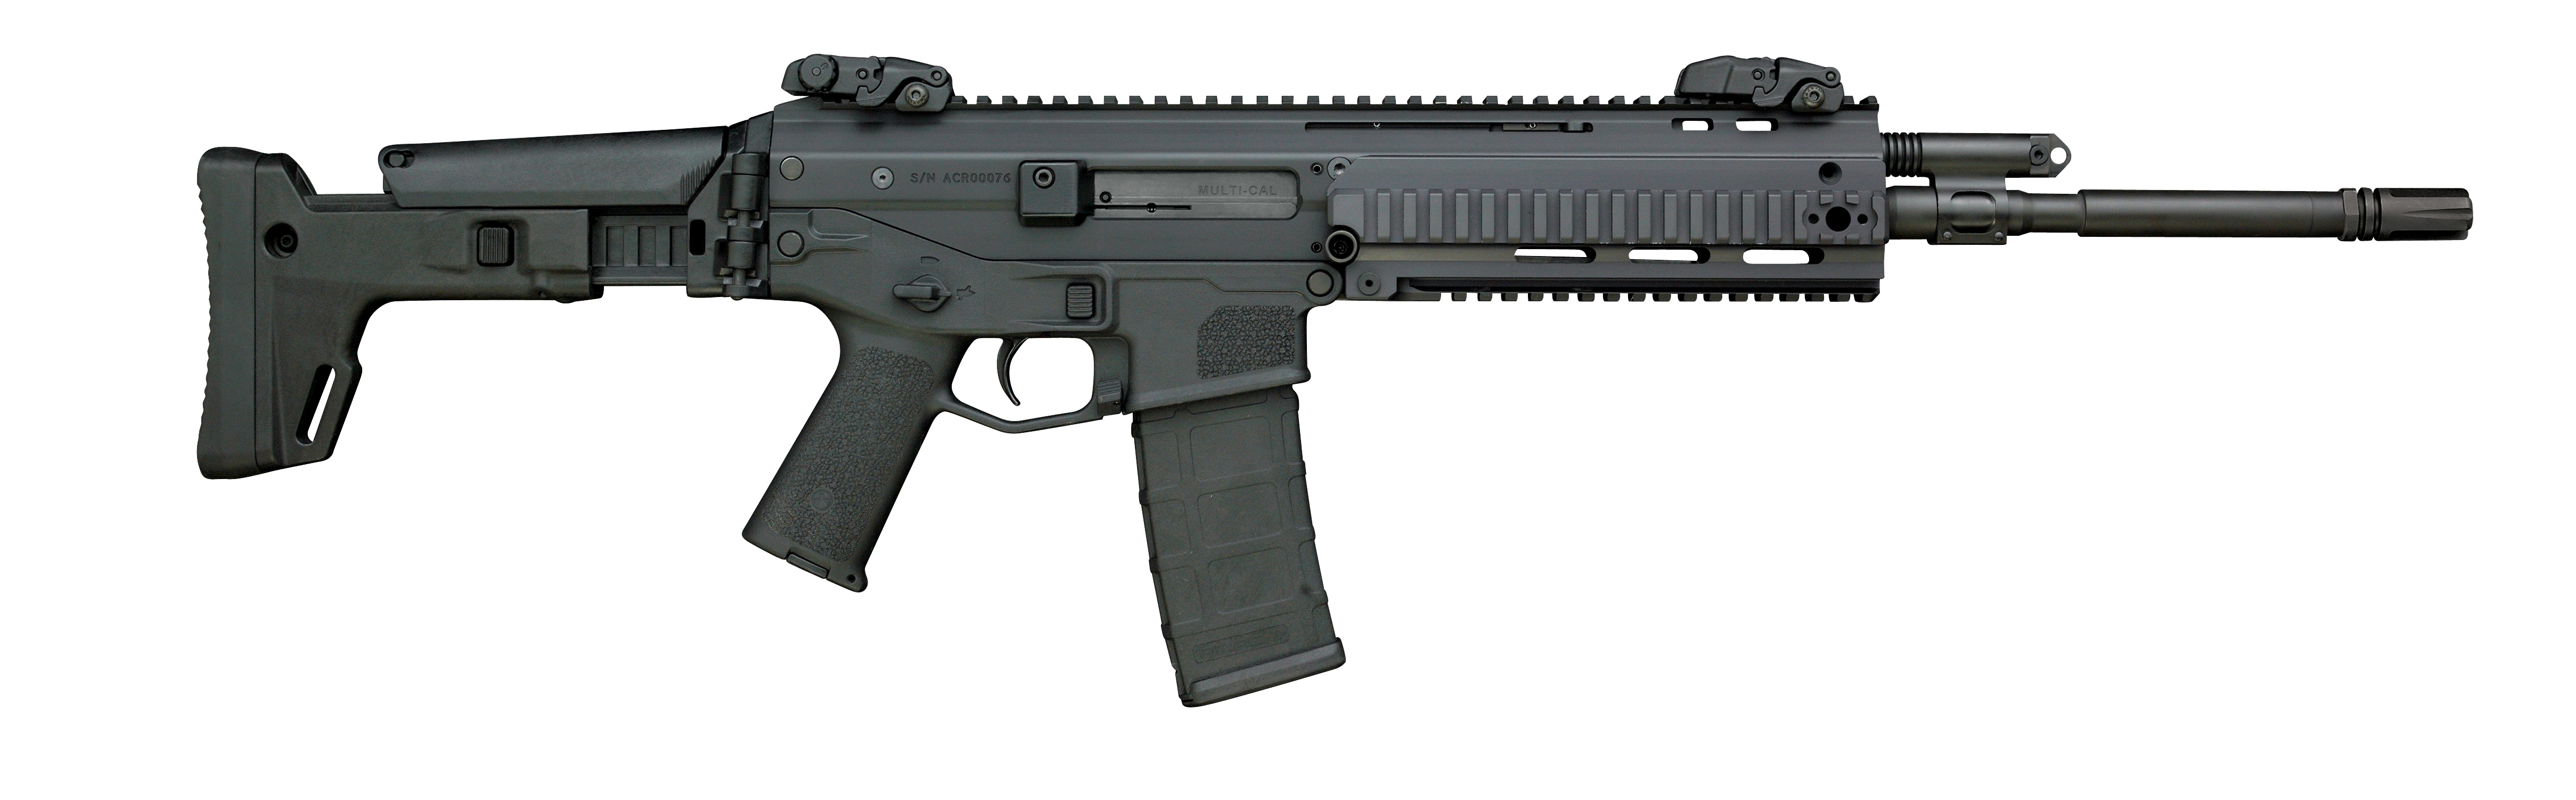 Bushmaster ACR vs Remington ACR